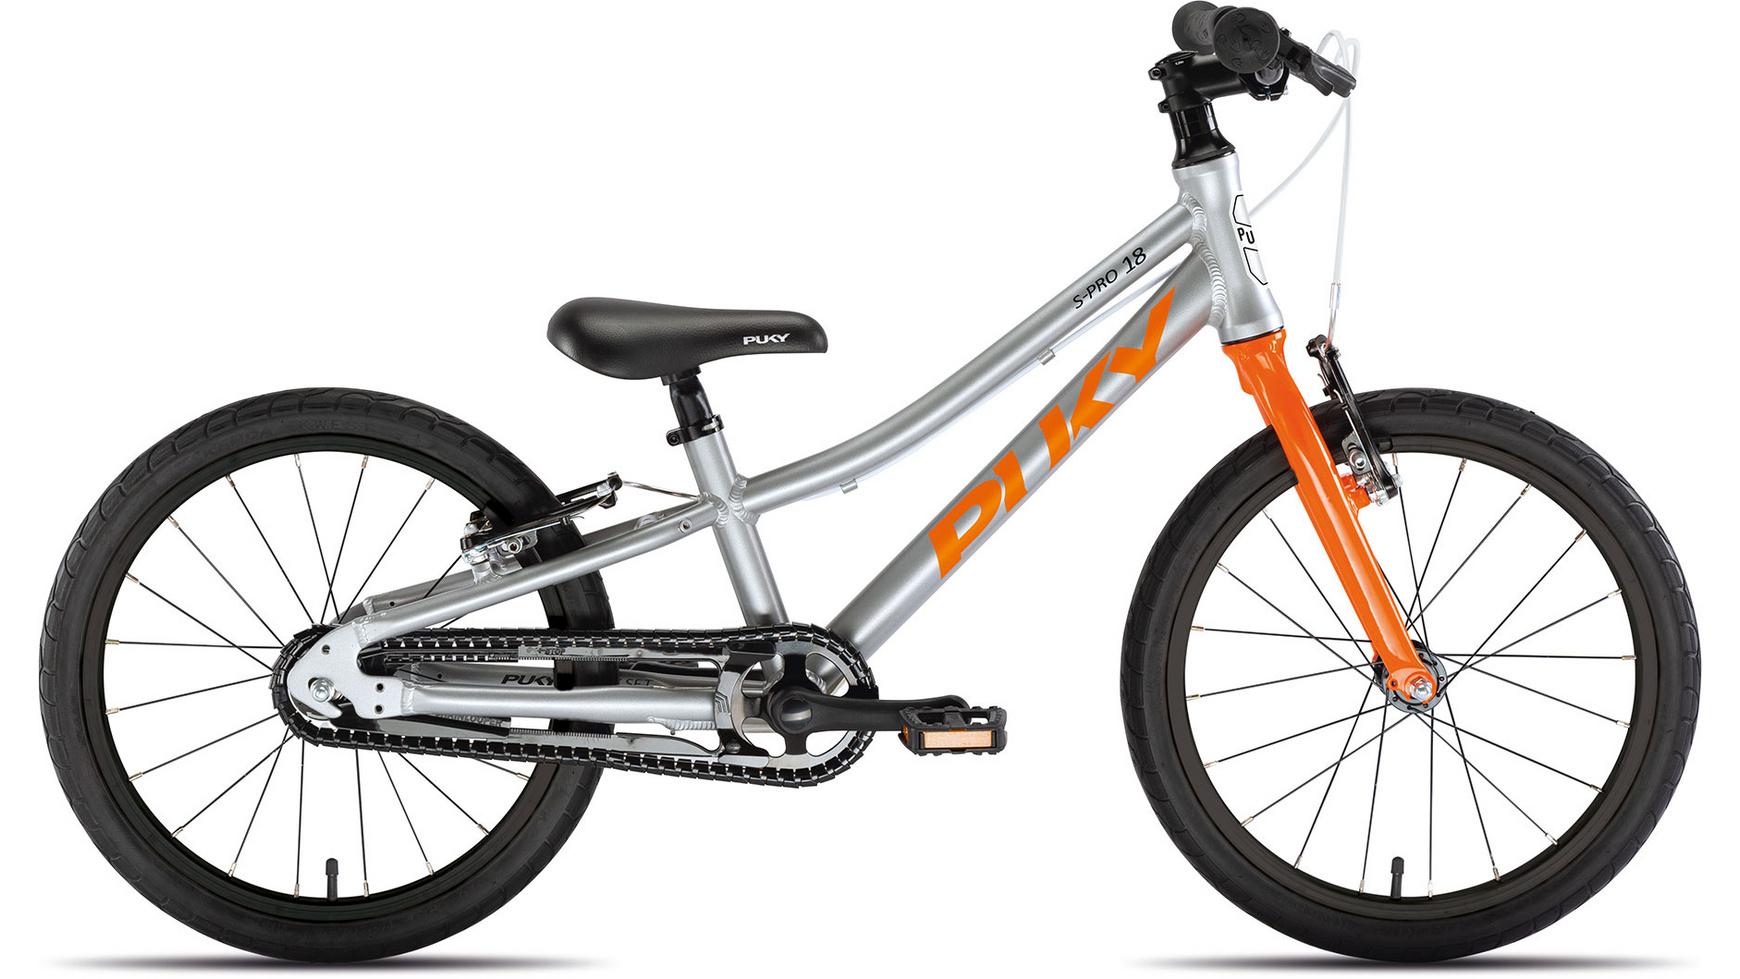 Puky LS-PRO 18 ZOLL ALU Kinderfahrrad 6,3kg [bicycles.de]